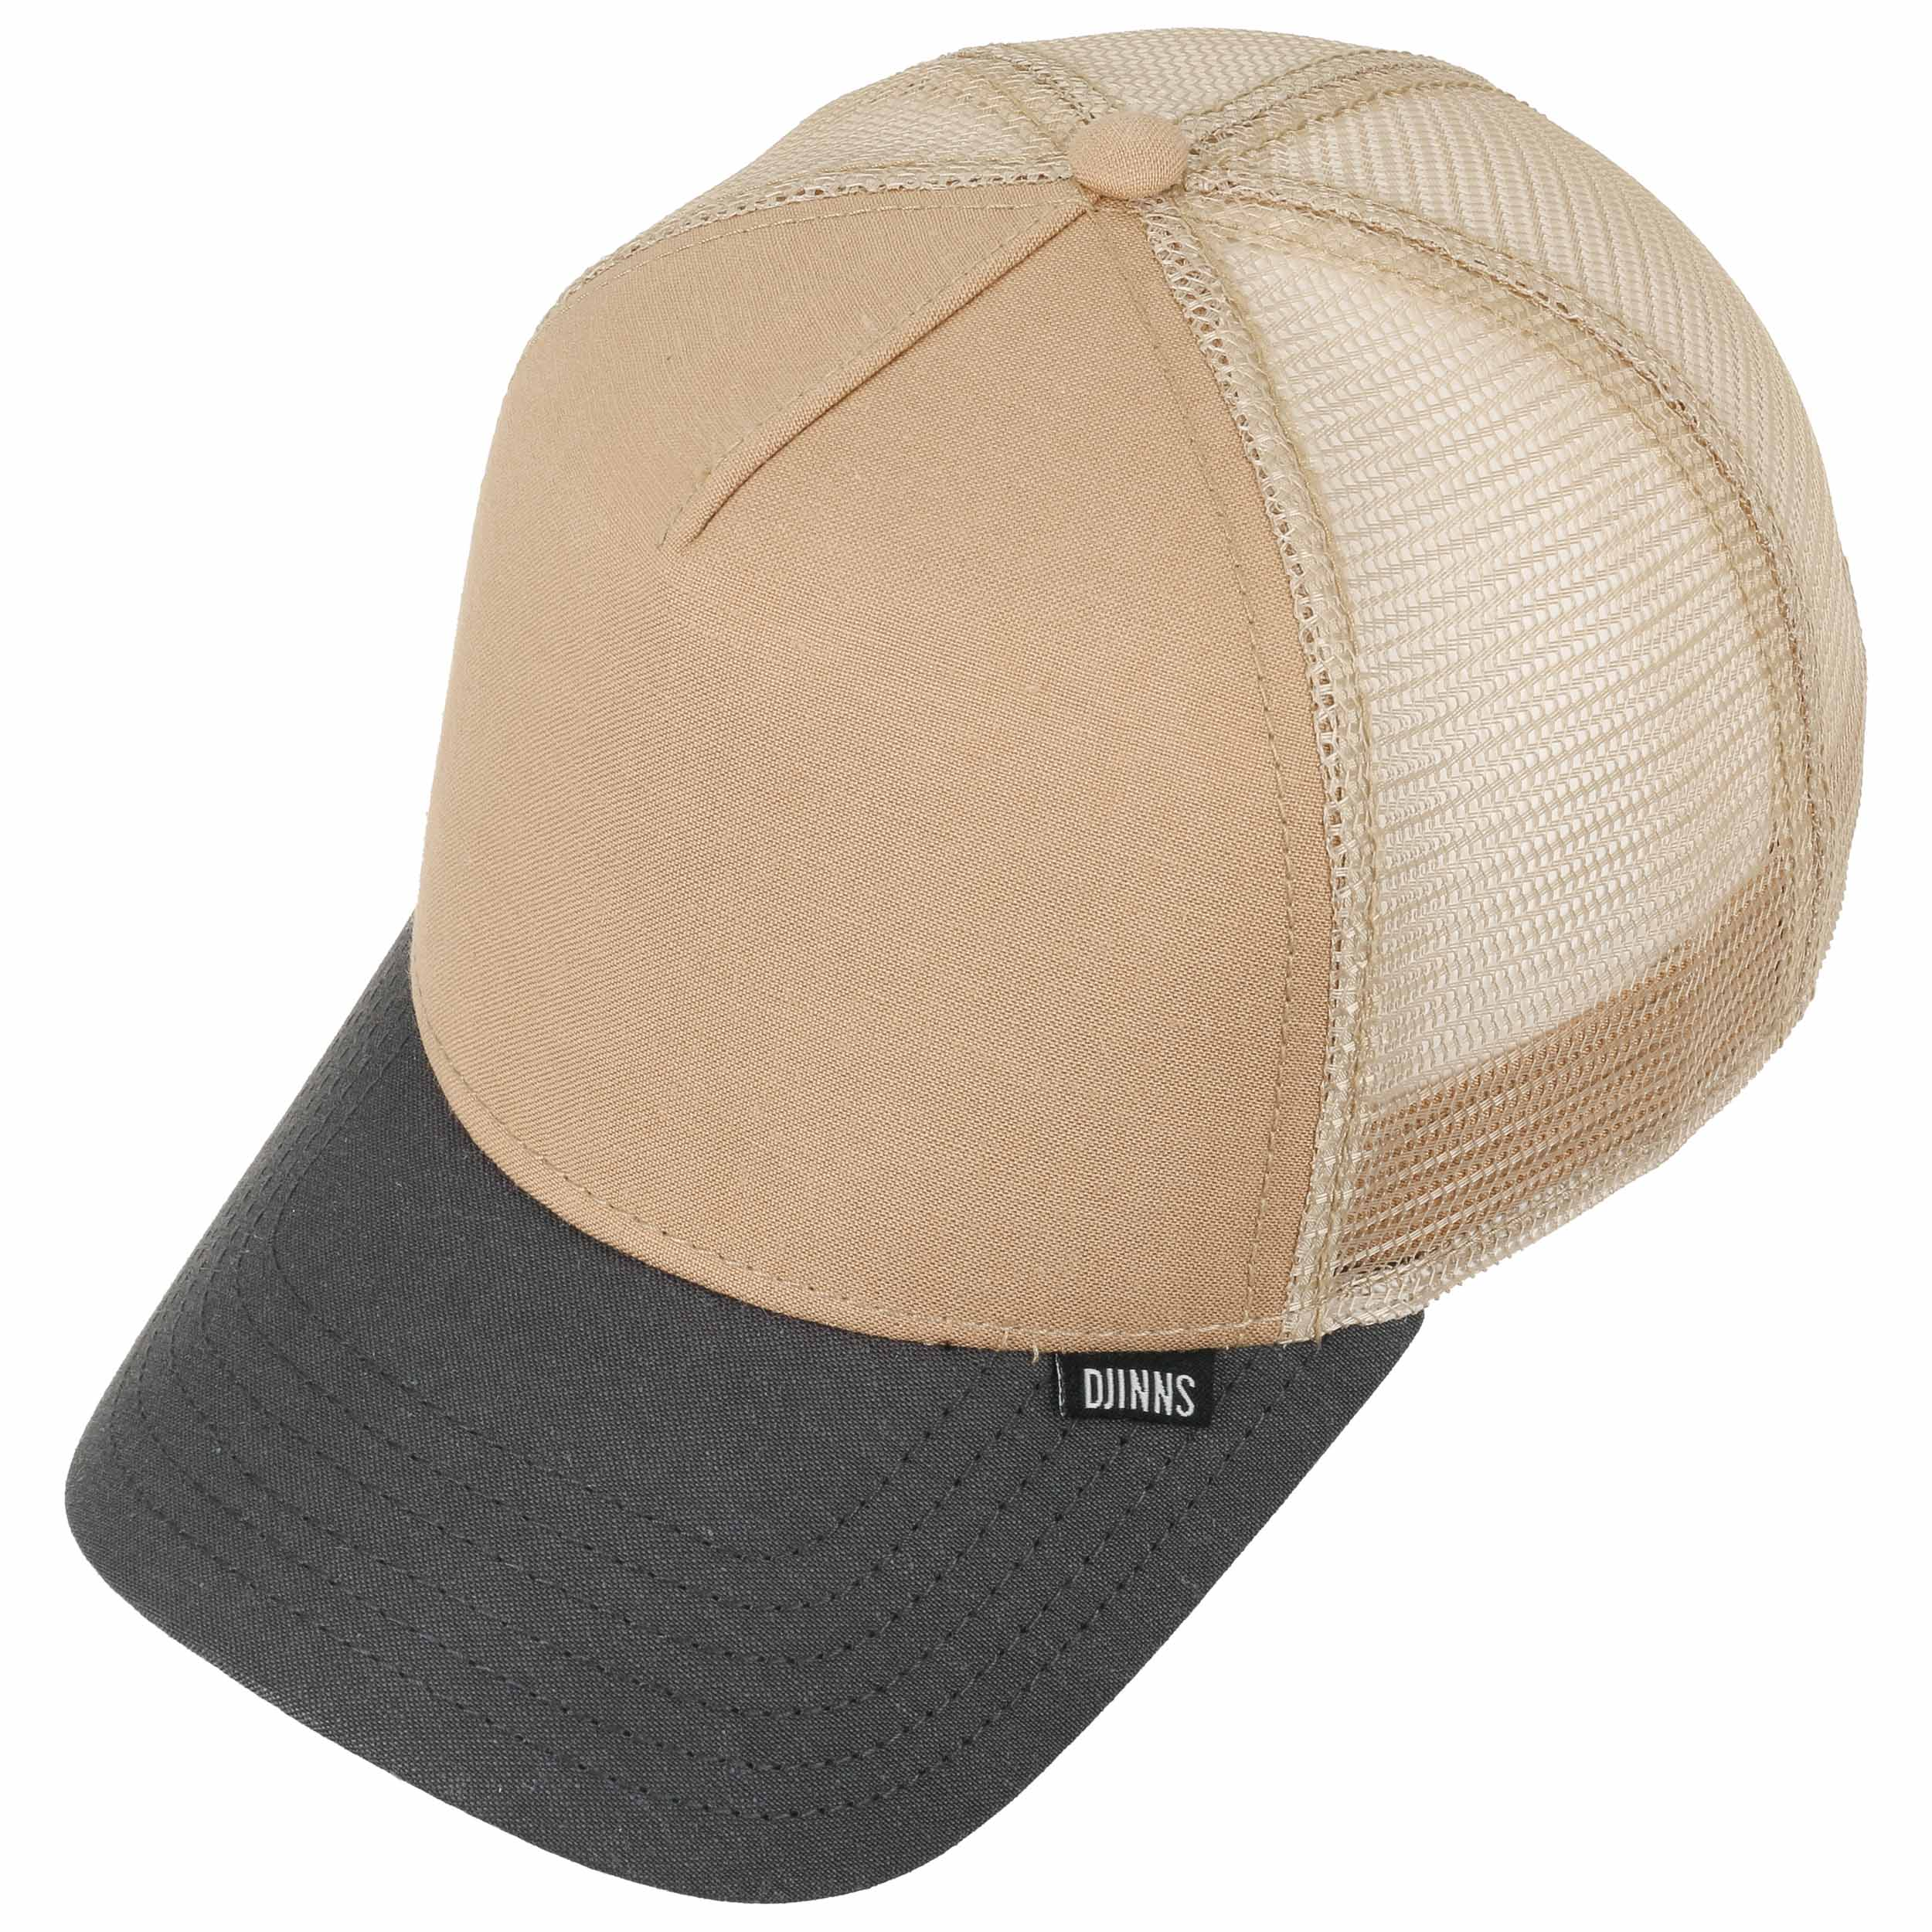 soft canvas hft trucker cap by djinns gbp 22 95 hats. Black Bedroom Furniture Sets. Home Design Ideas